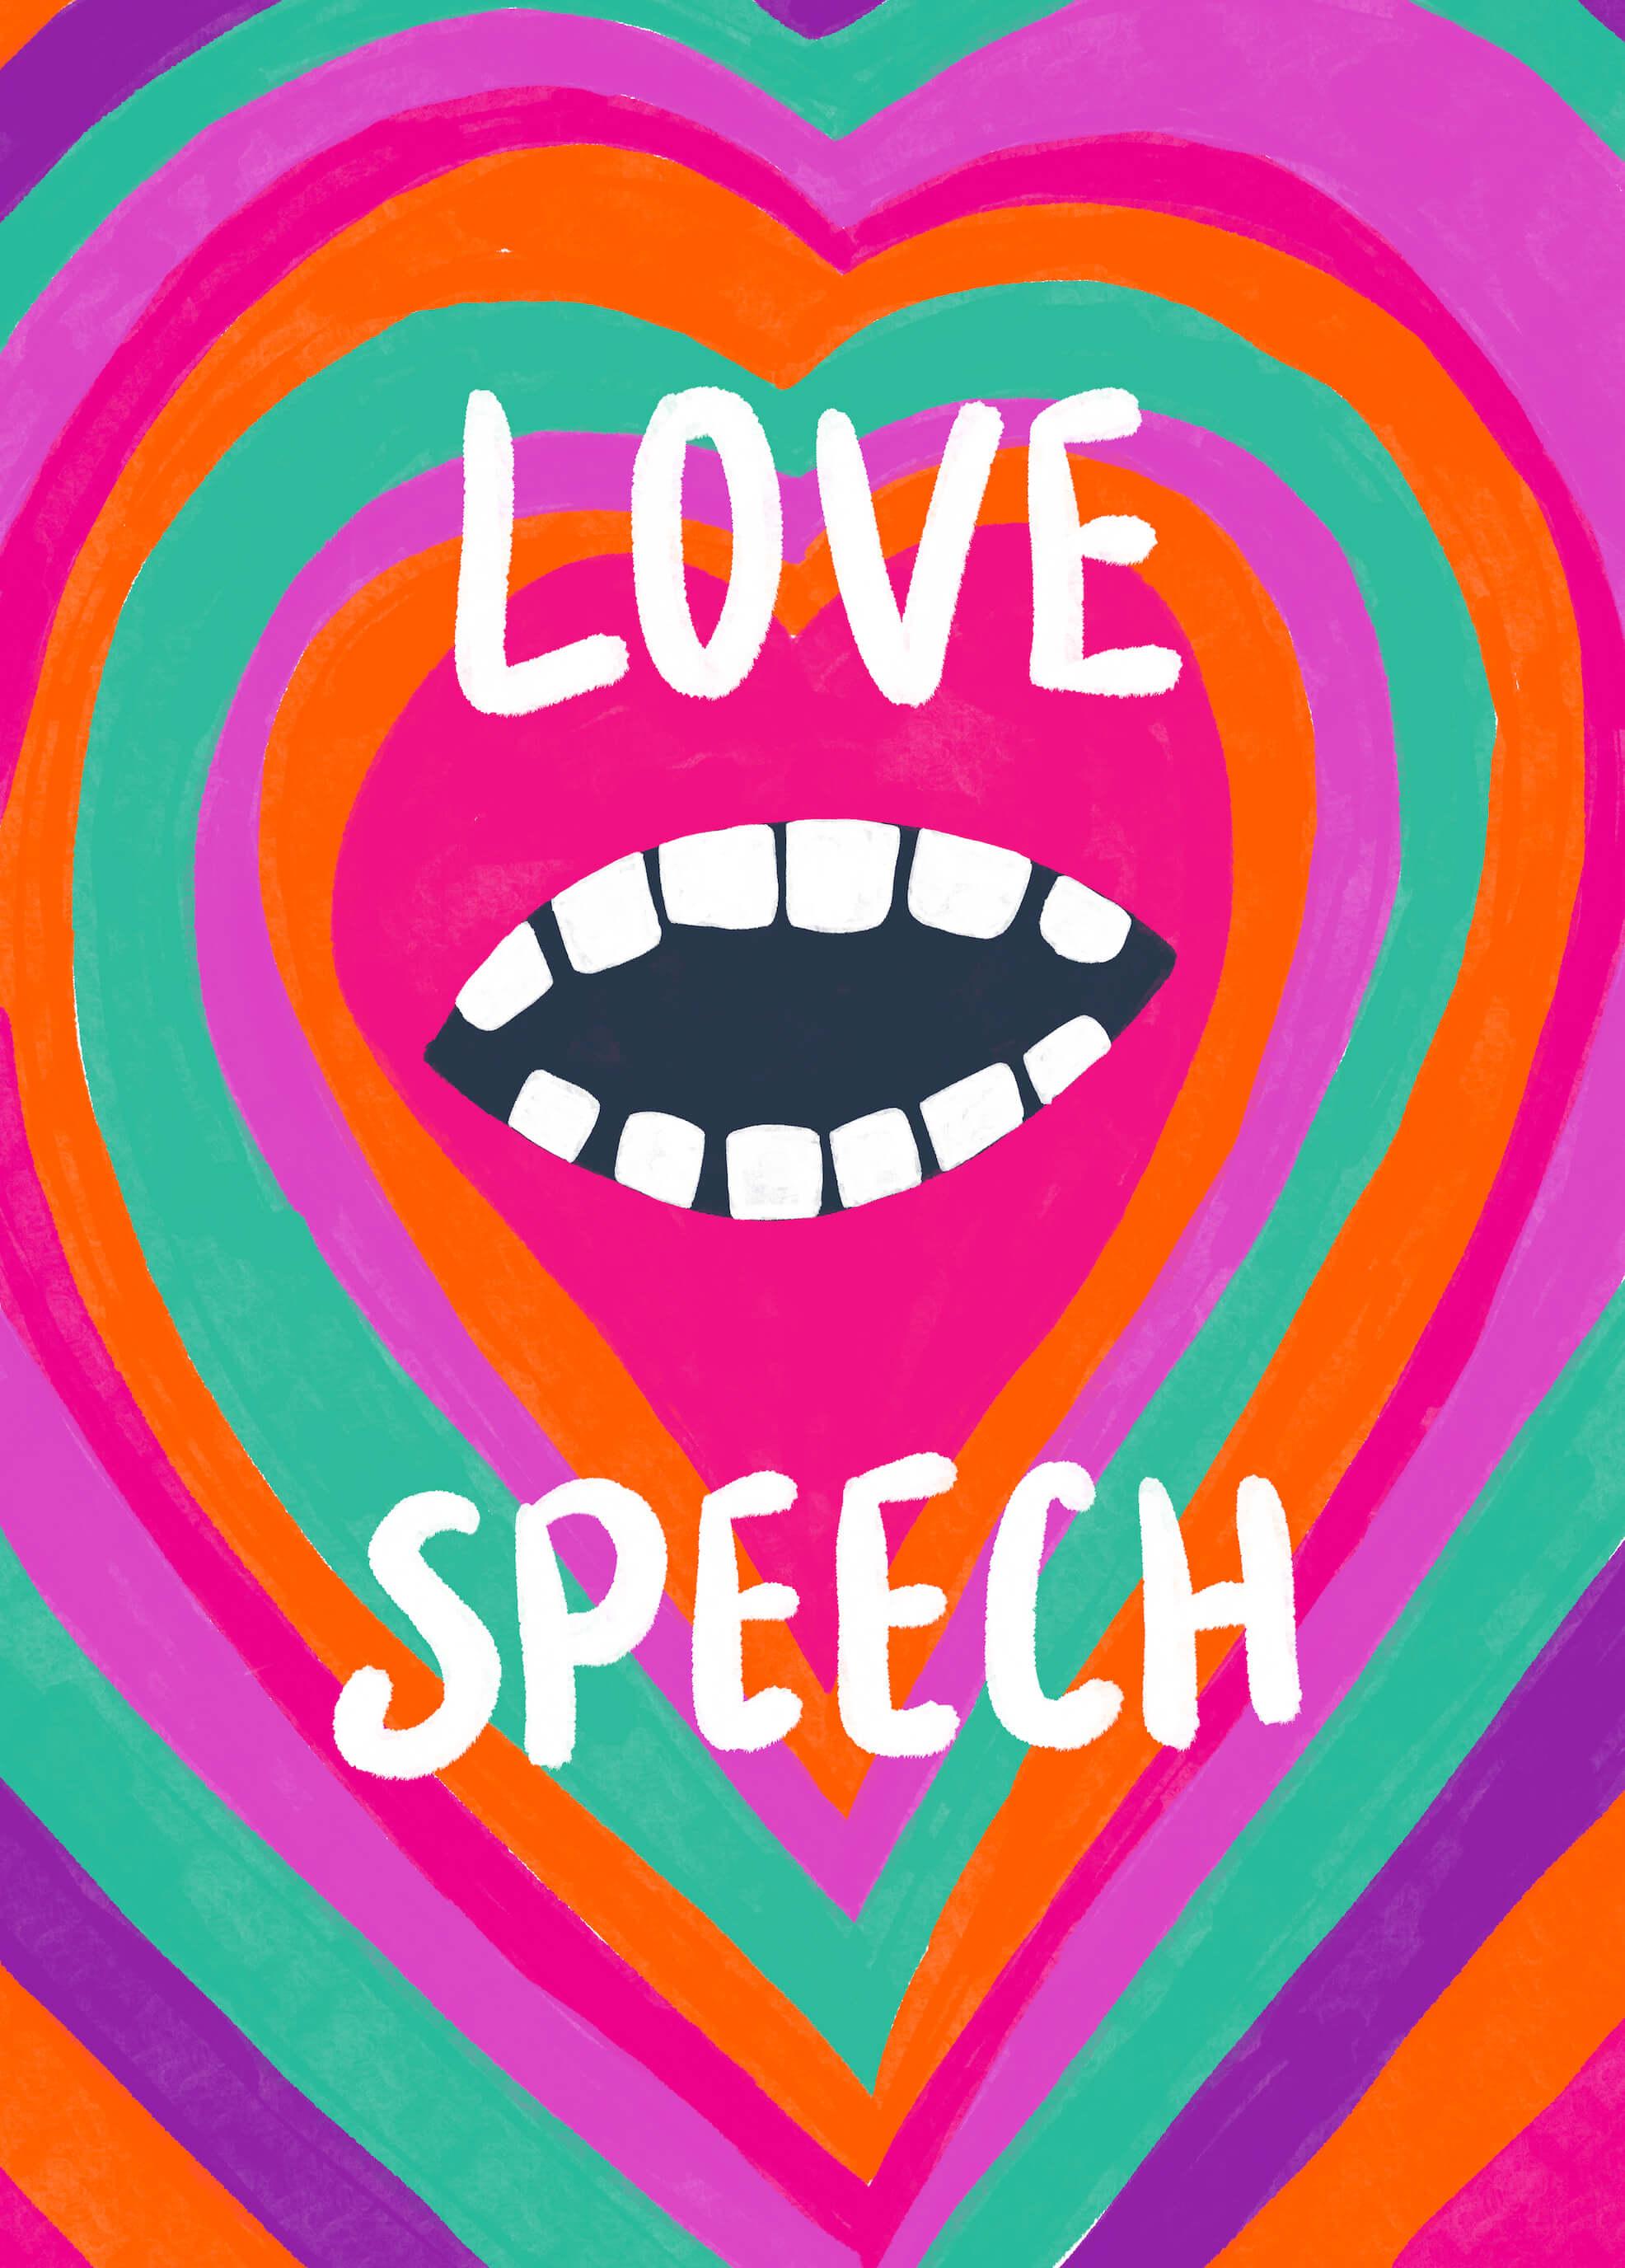 Love Speech (series 2/2) main image